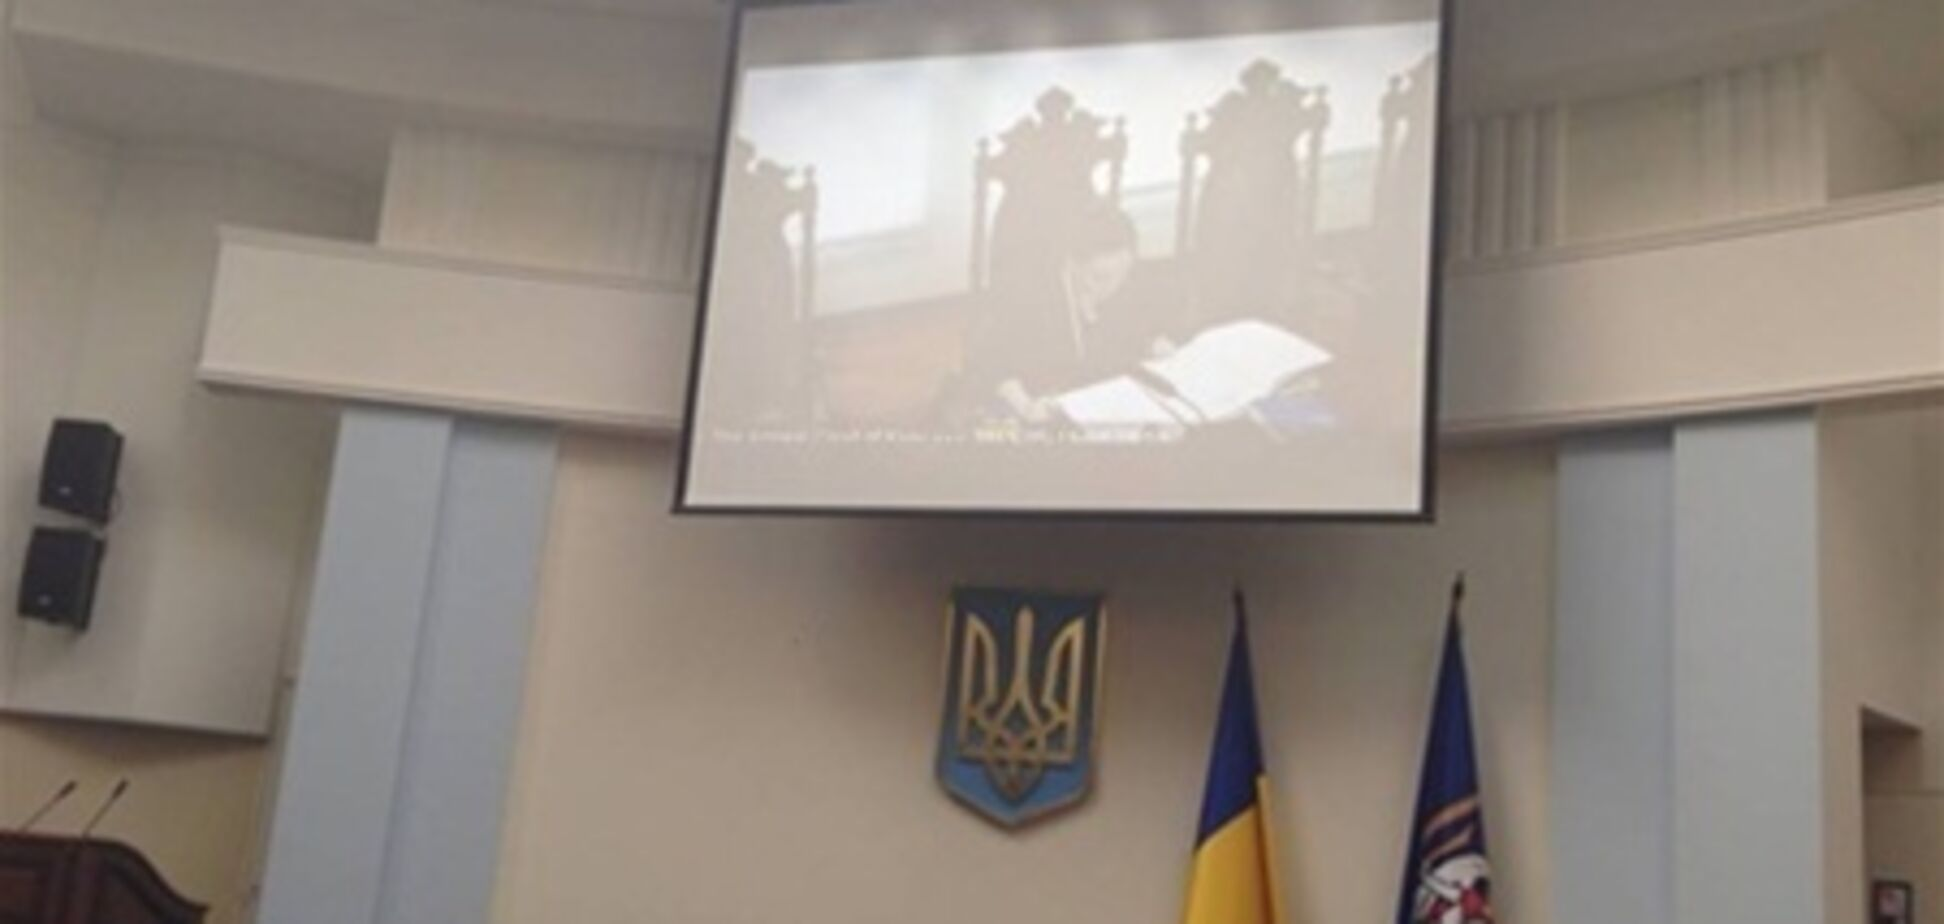 Кириченко: Тимошенко хотела на меня повесить убийство Щербаня